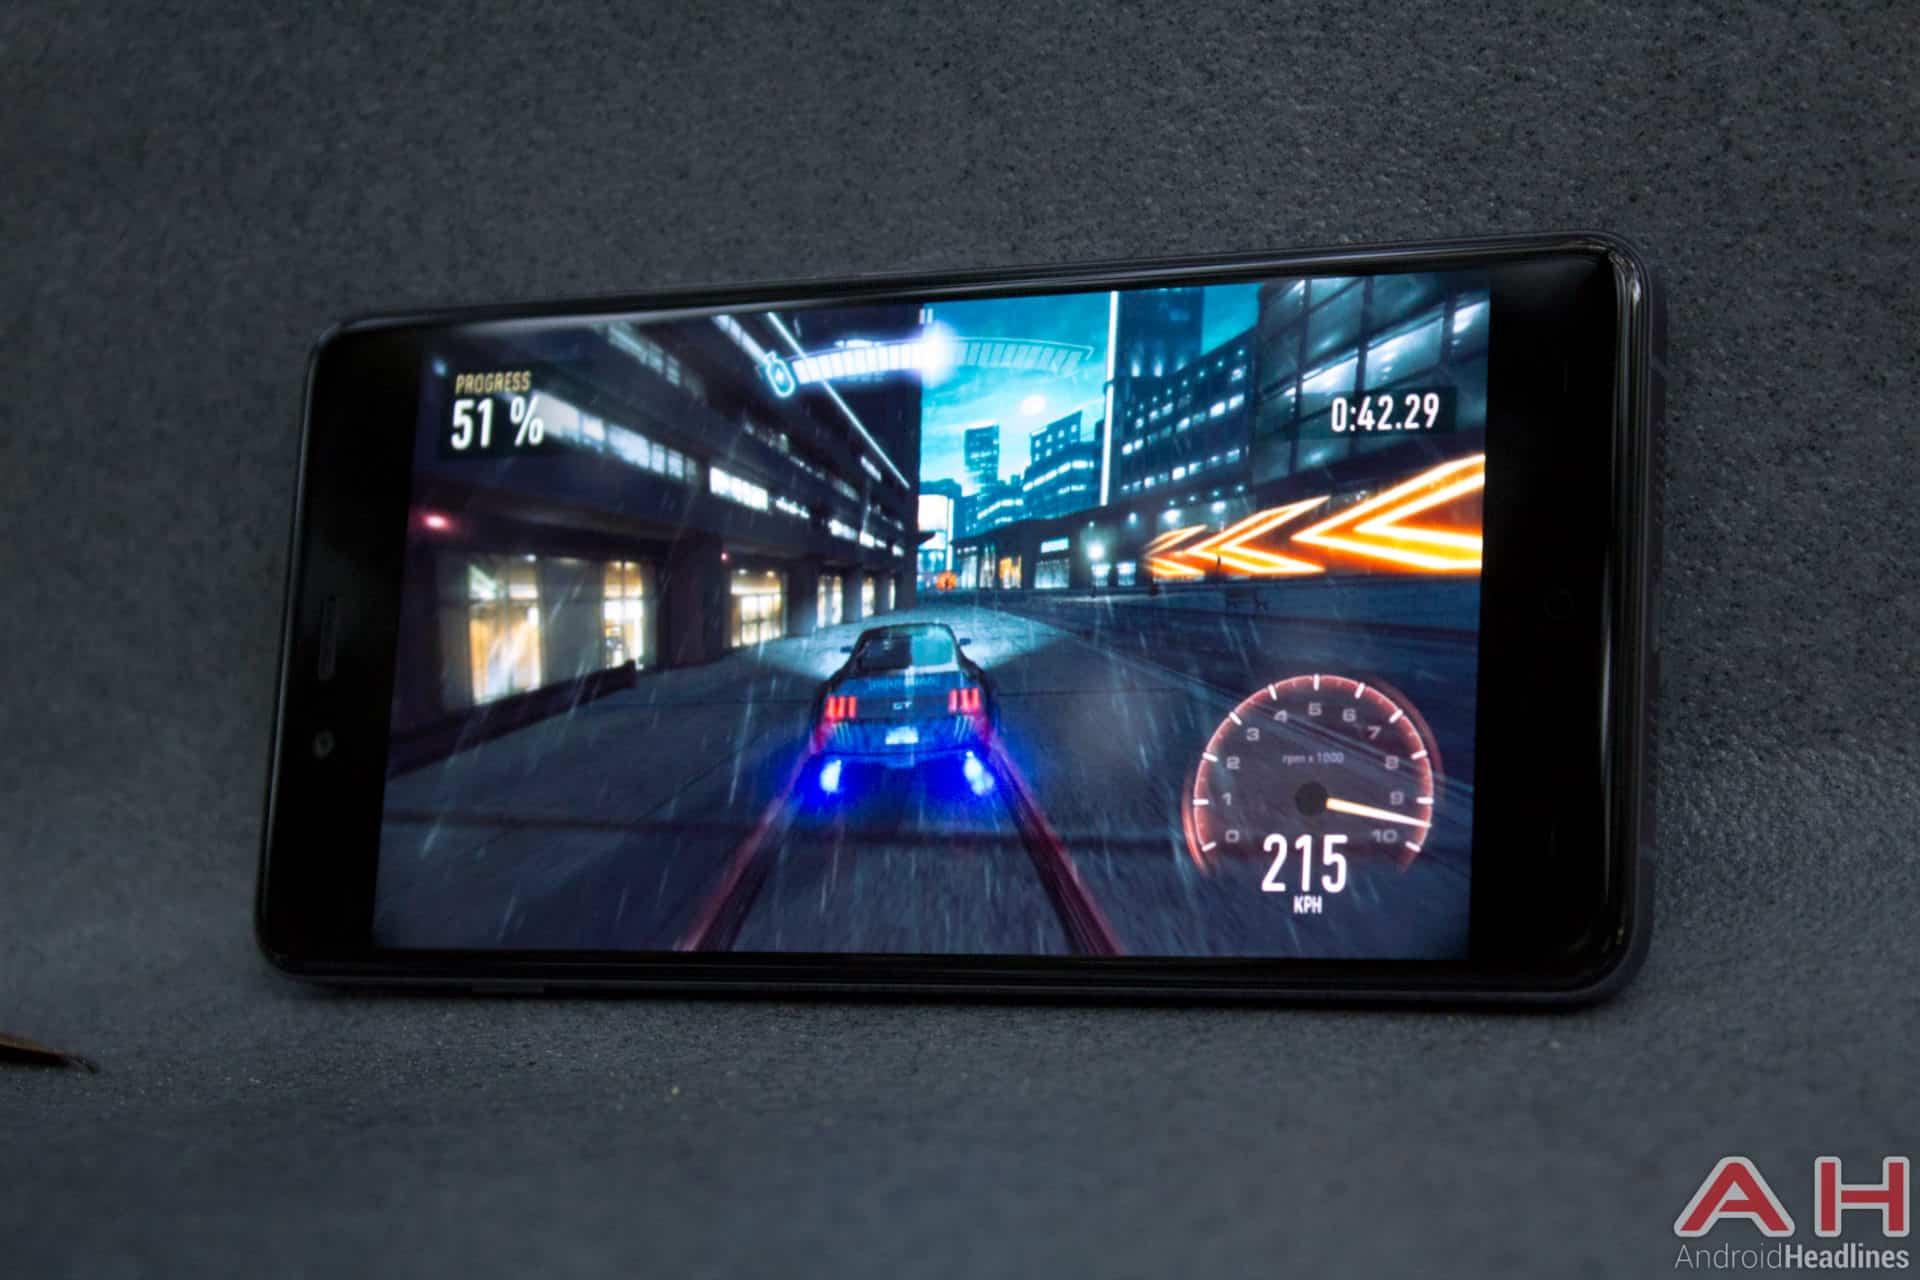 OnePlus-X-AH-performance